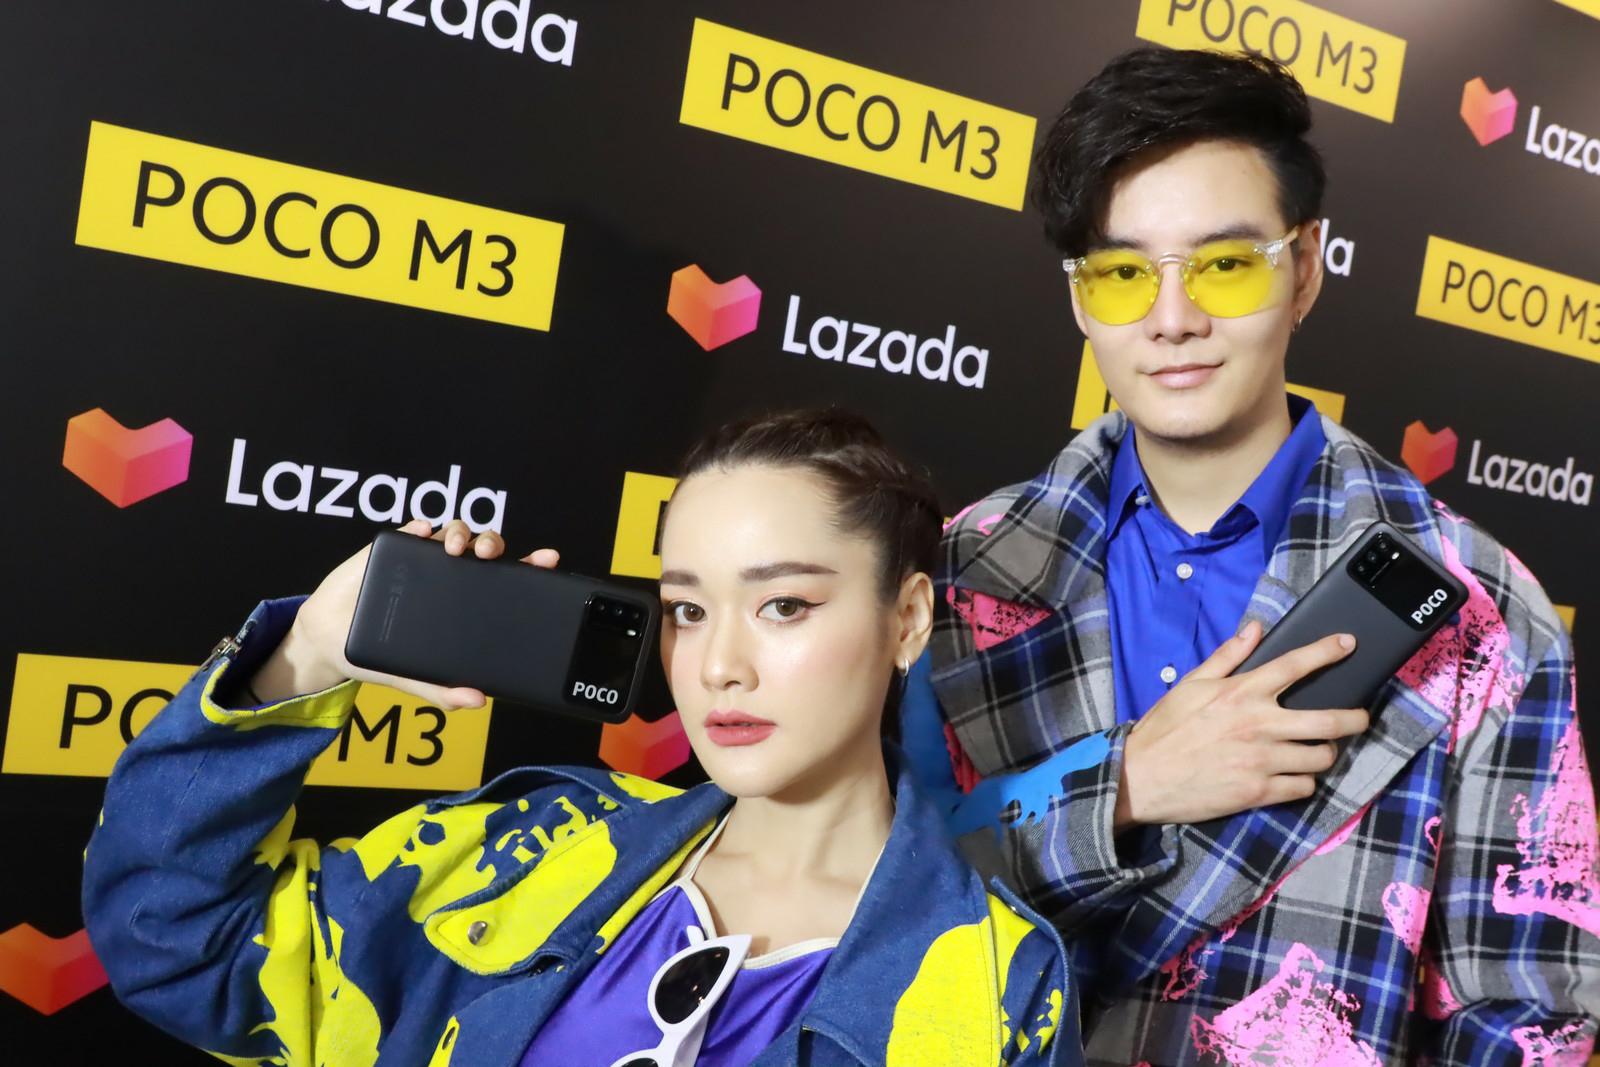 POCO จับมือ Lazada เปิดตัวสมาร์ทโฟนเพื่อความบันเทิงรุ่นเล็กสุดคุ้ม POCO M3 ที่ให้คุณได้มากกว่า อย่างเป็นทางการในประเทศไทย